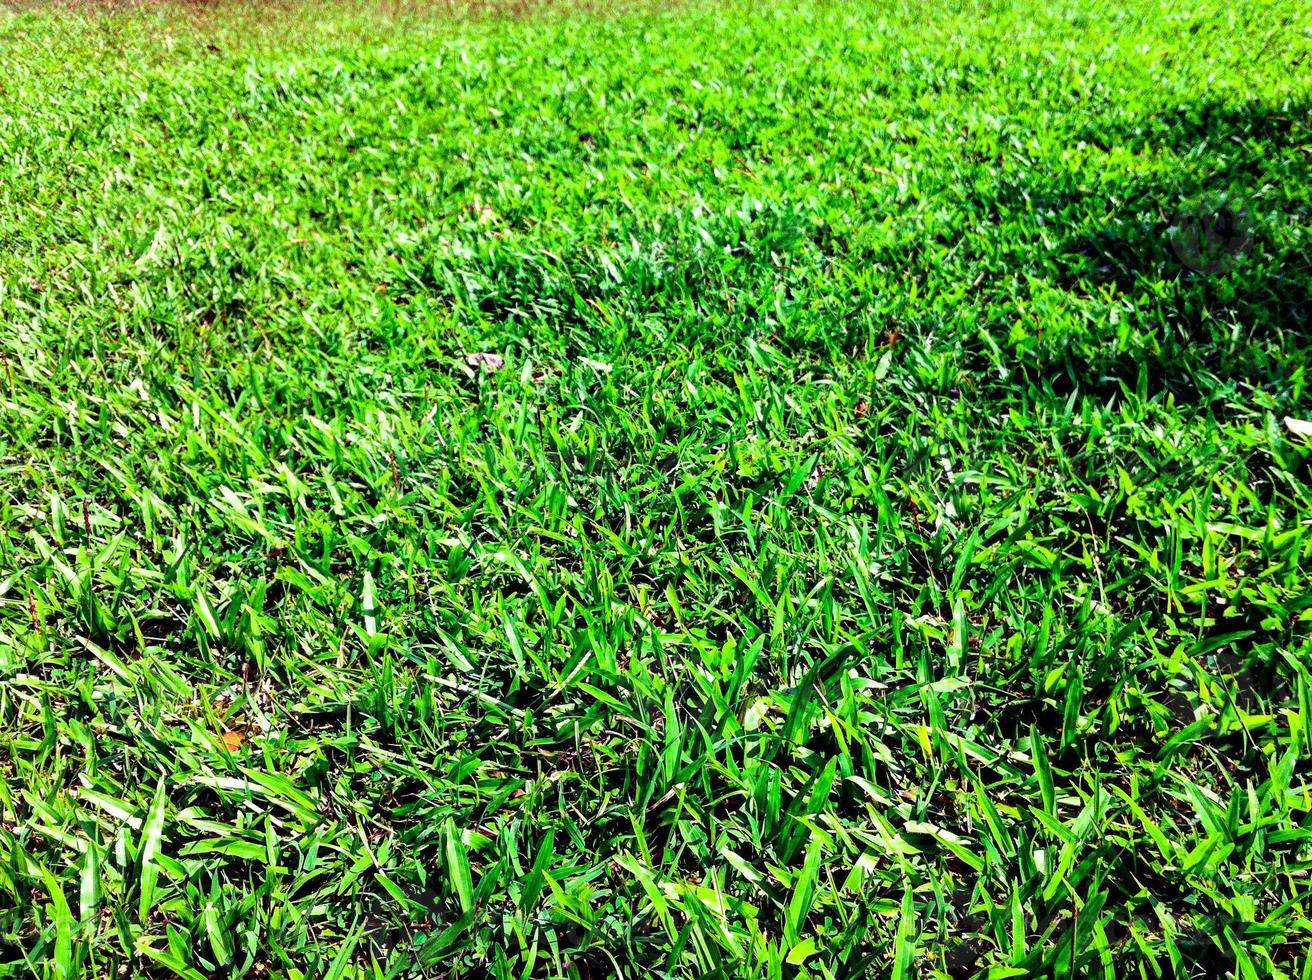 Green Lawn in garden beautiful photo